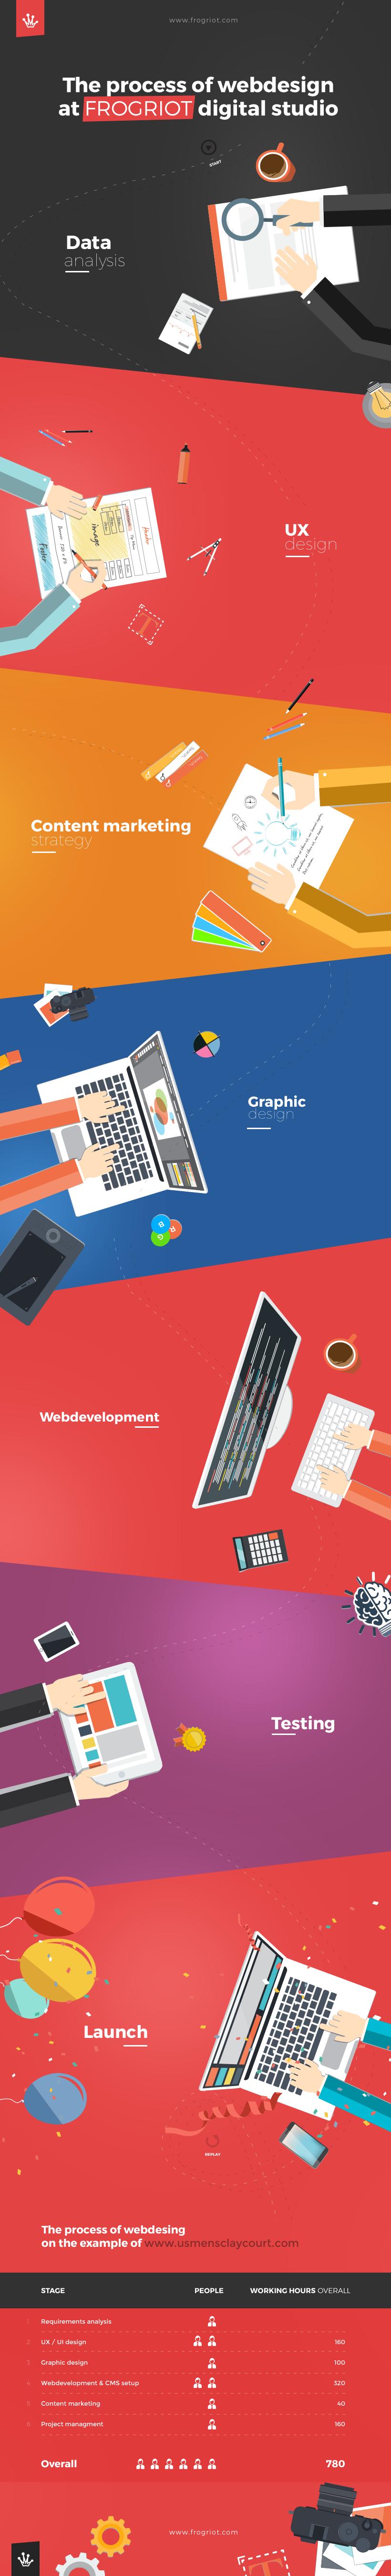 infografika_web3en2